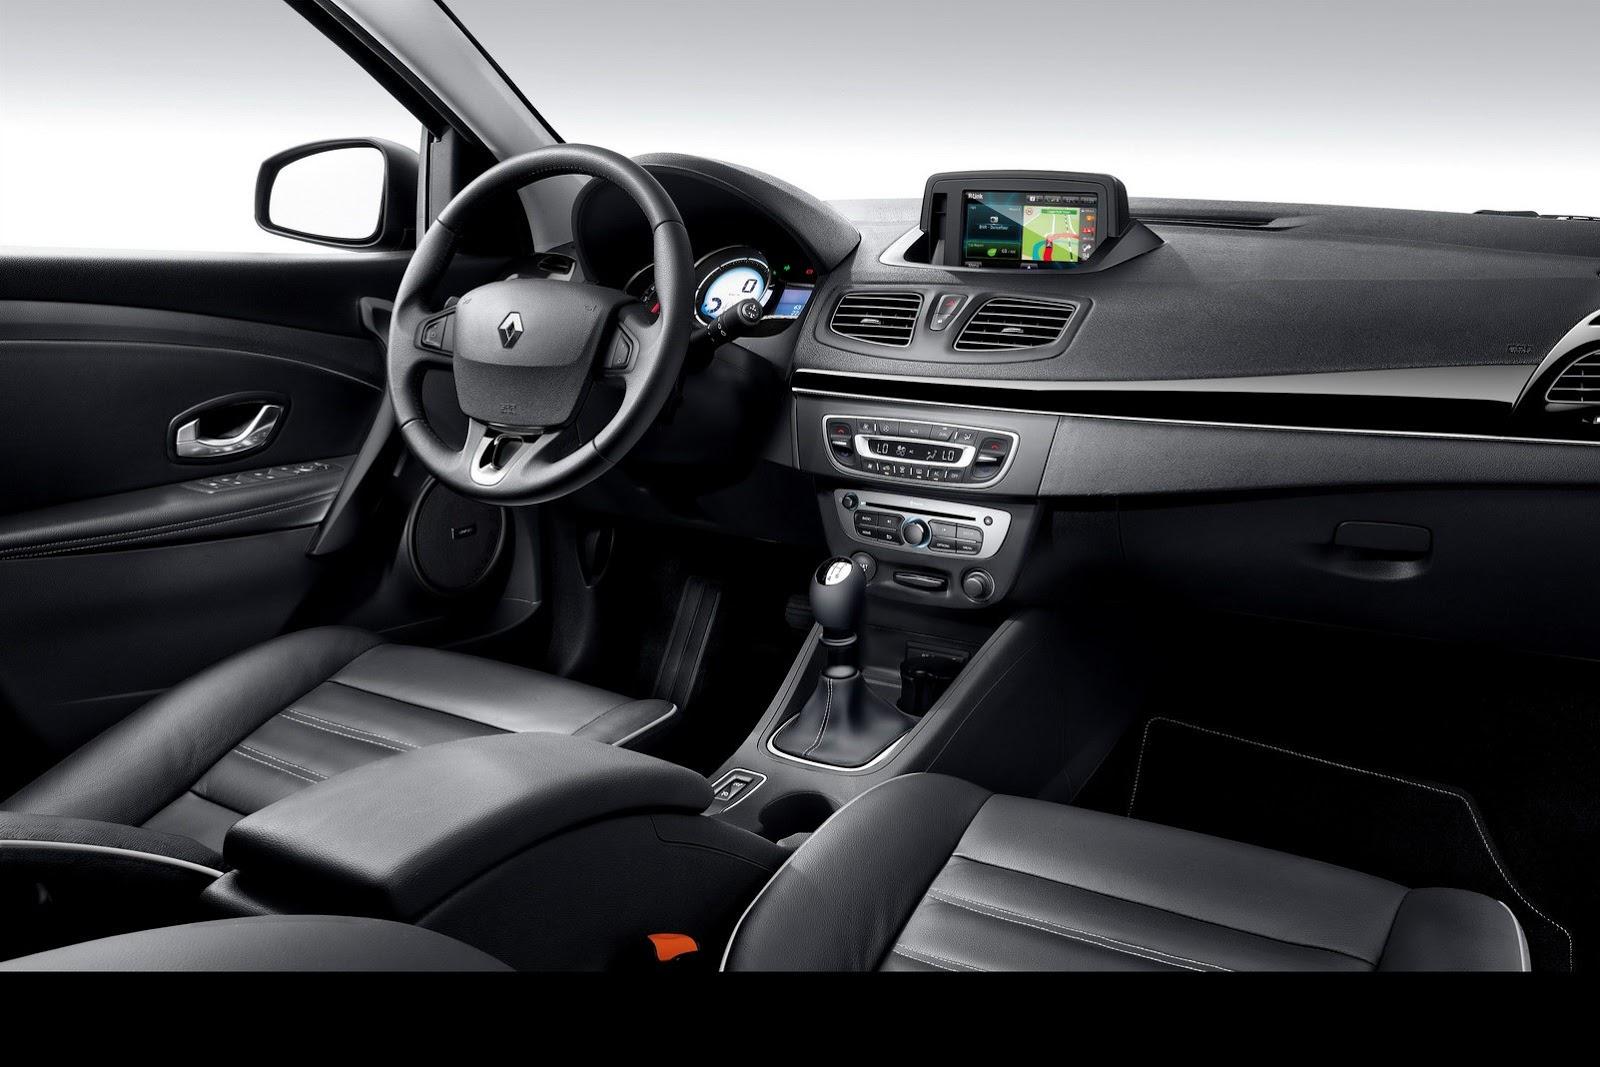 2013-Renault-Fluence-8